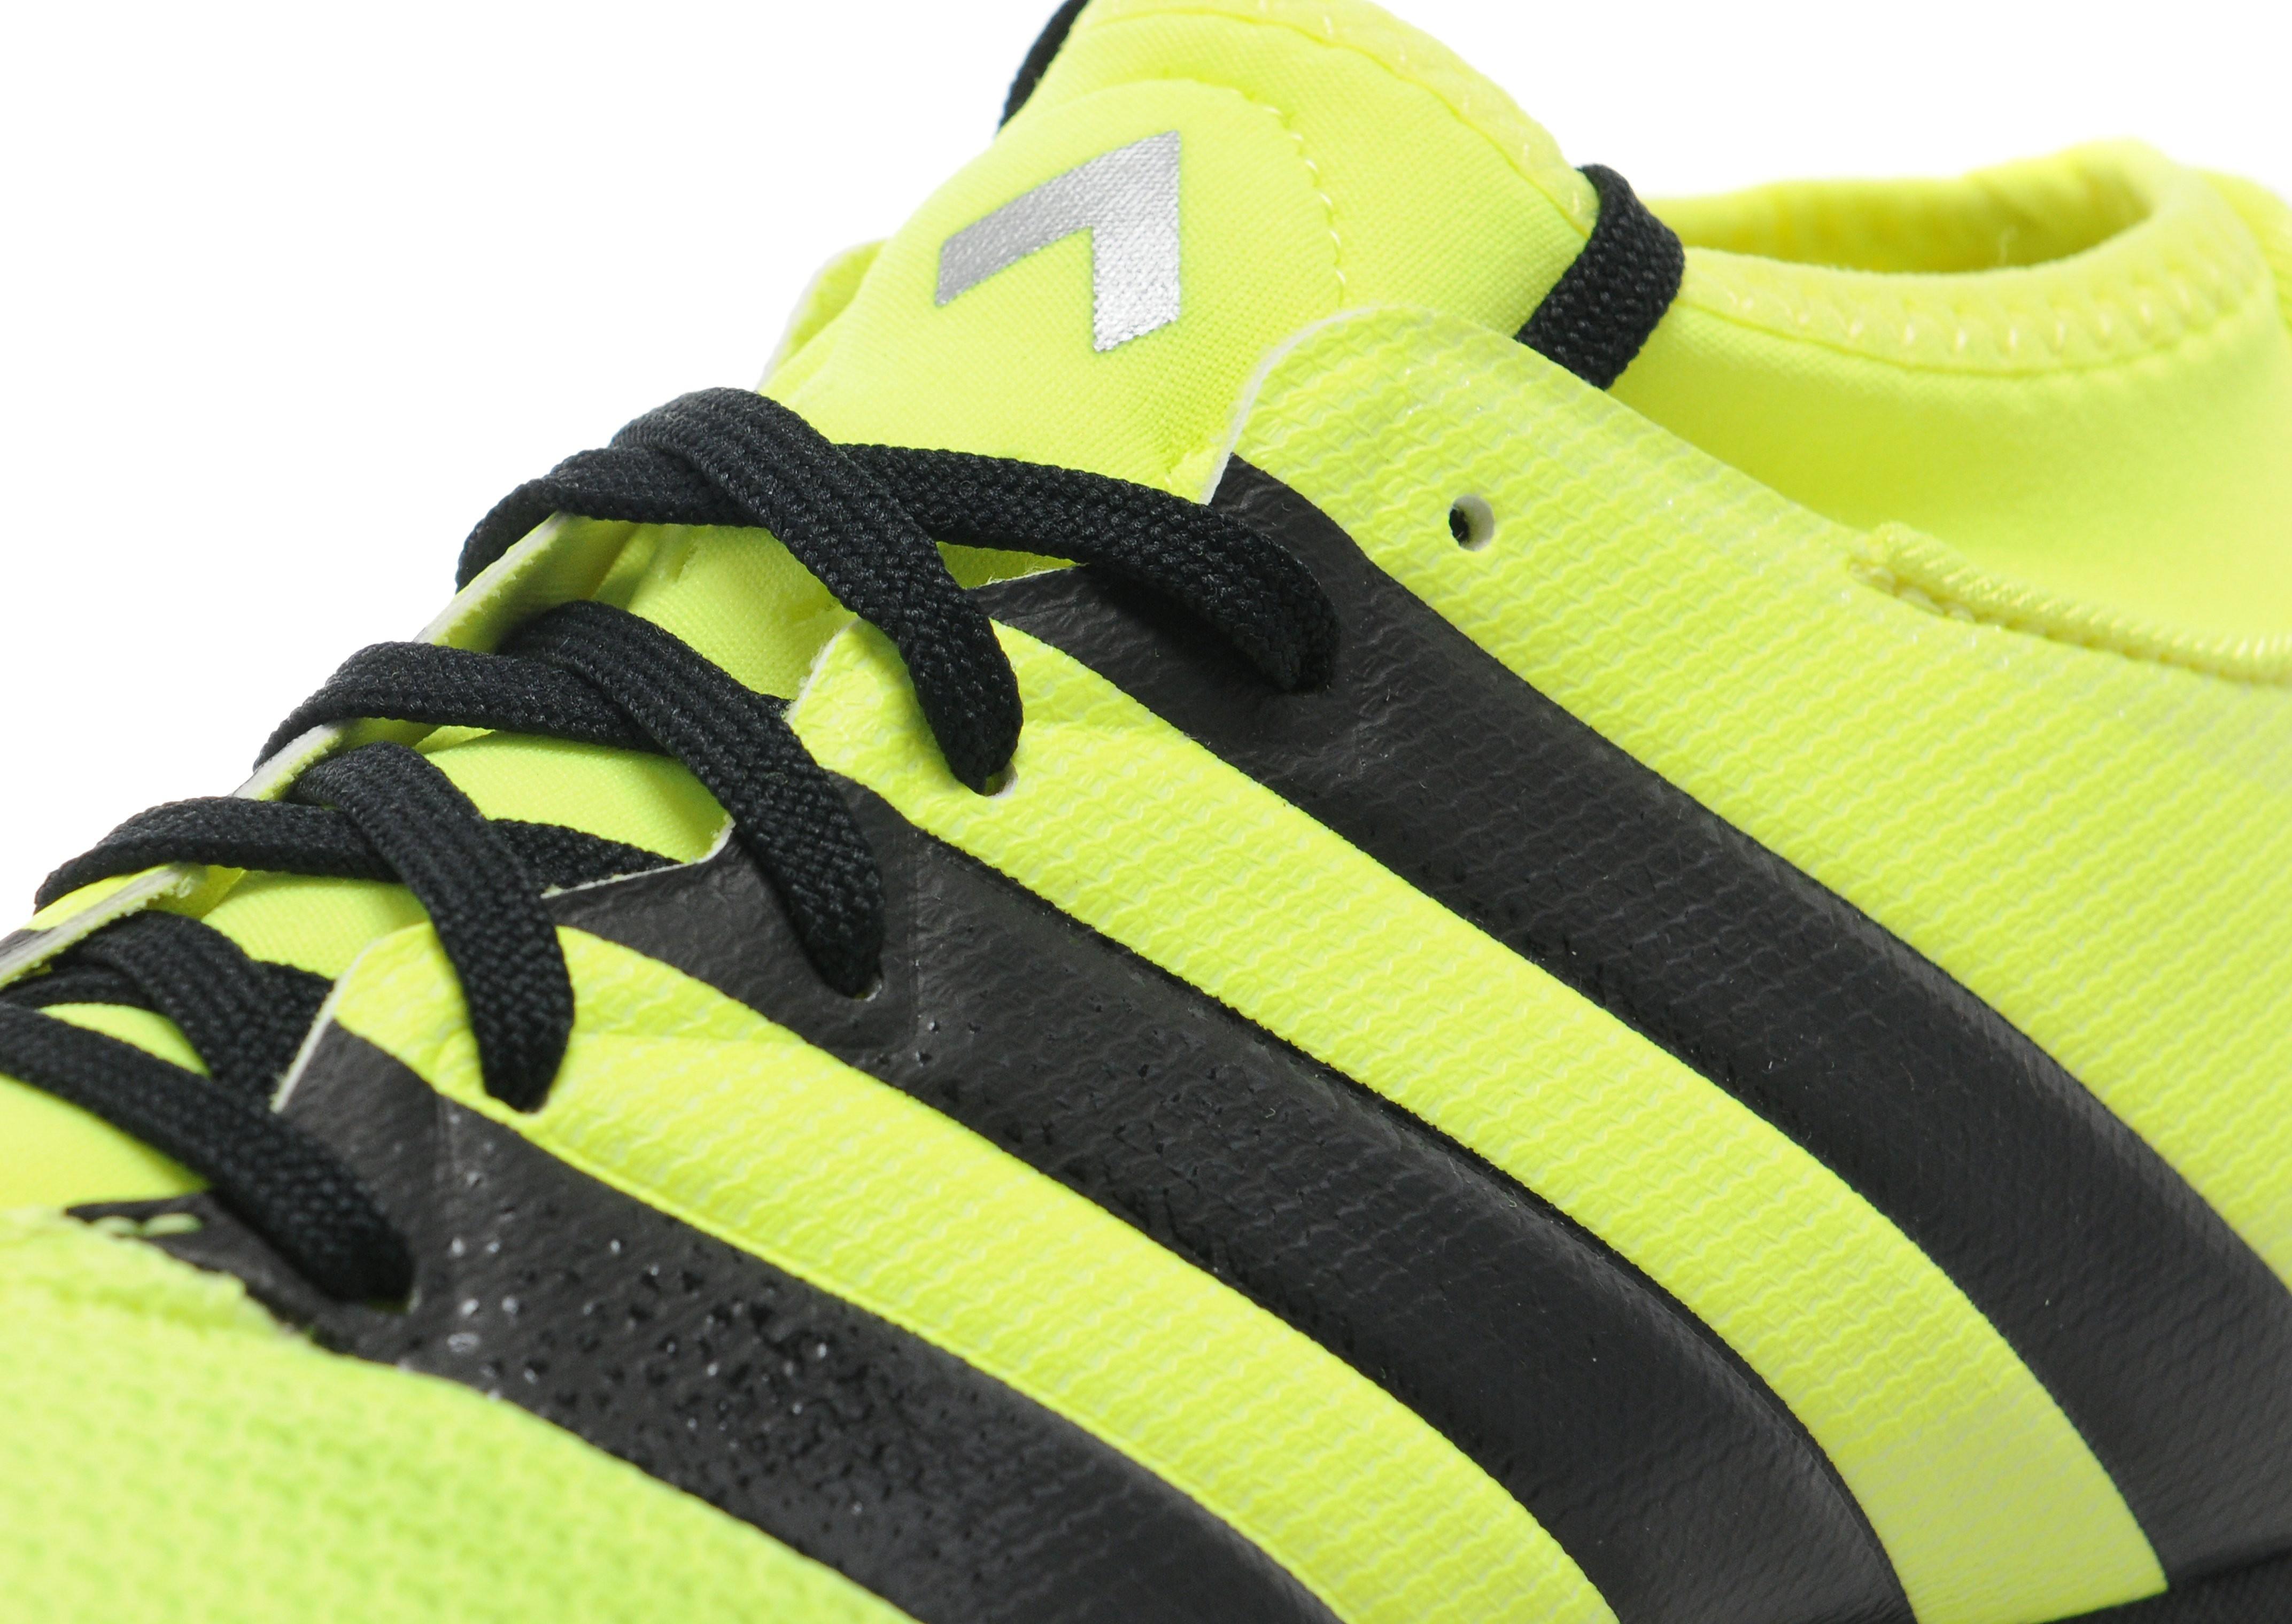 adidas Ace 16.3 Turf Junior